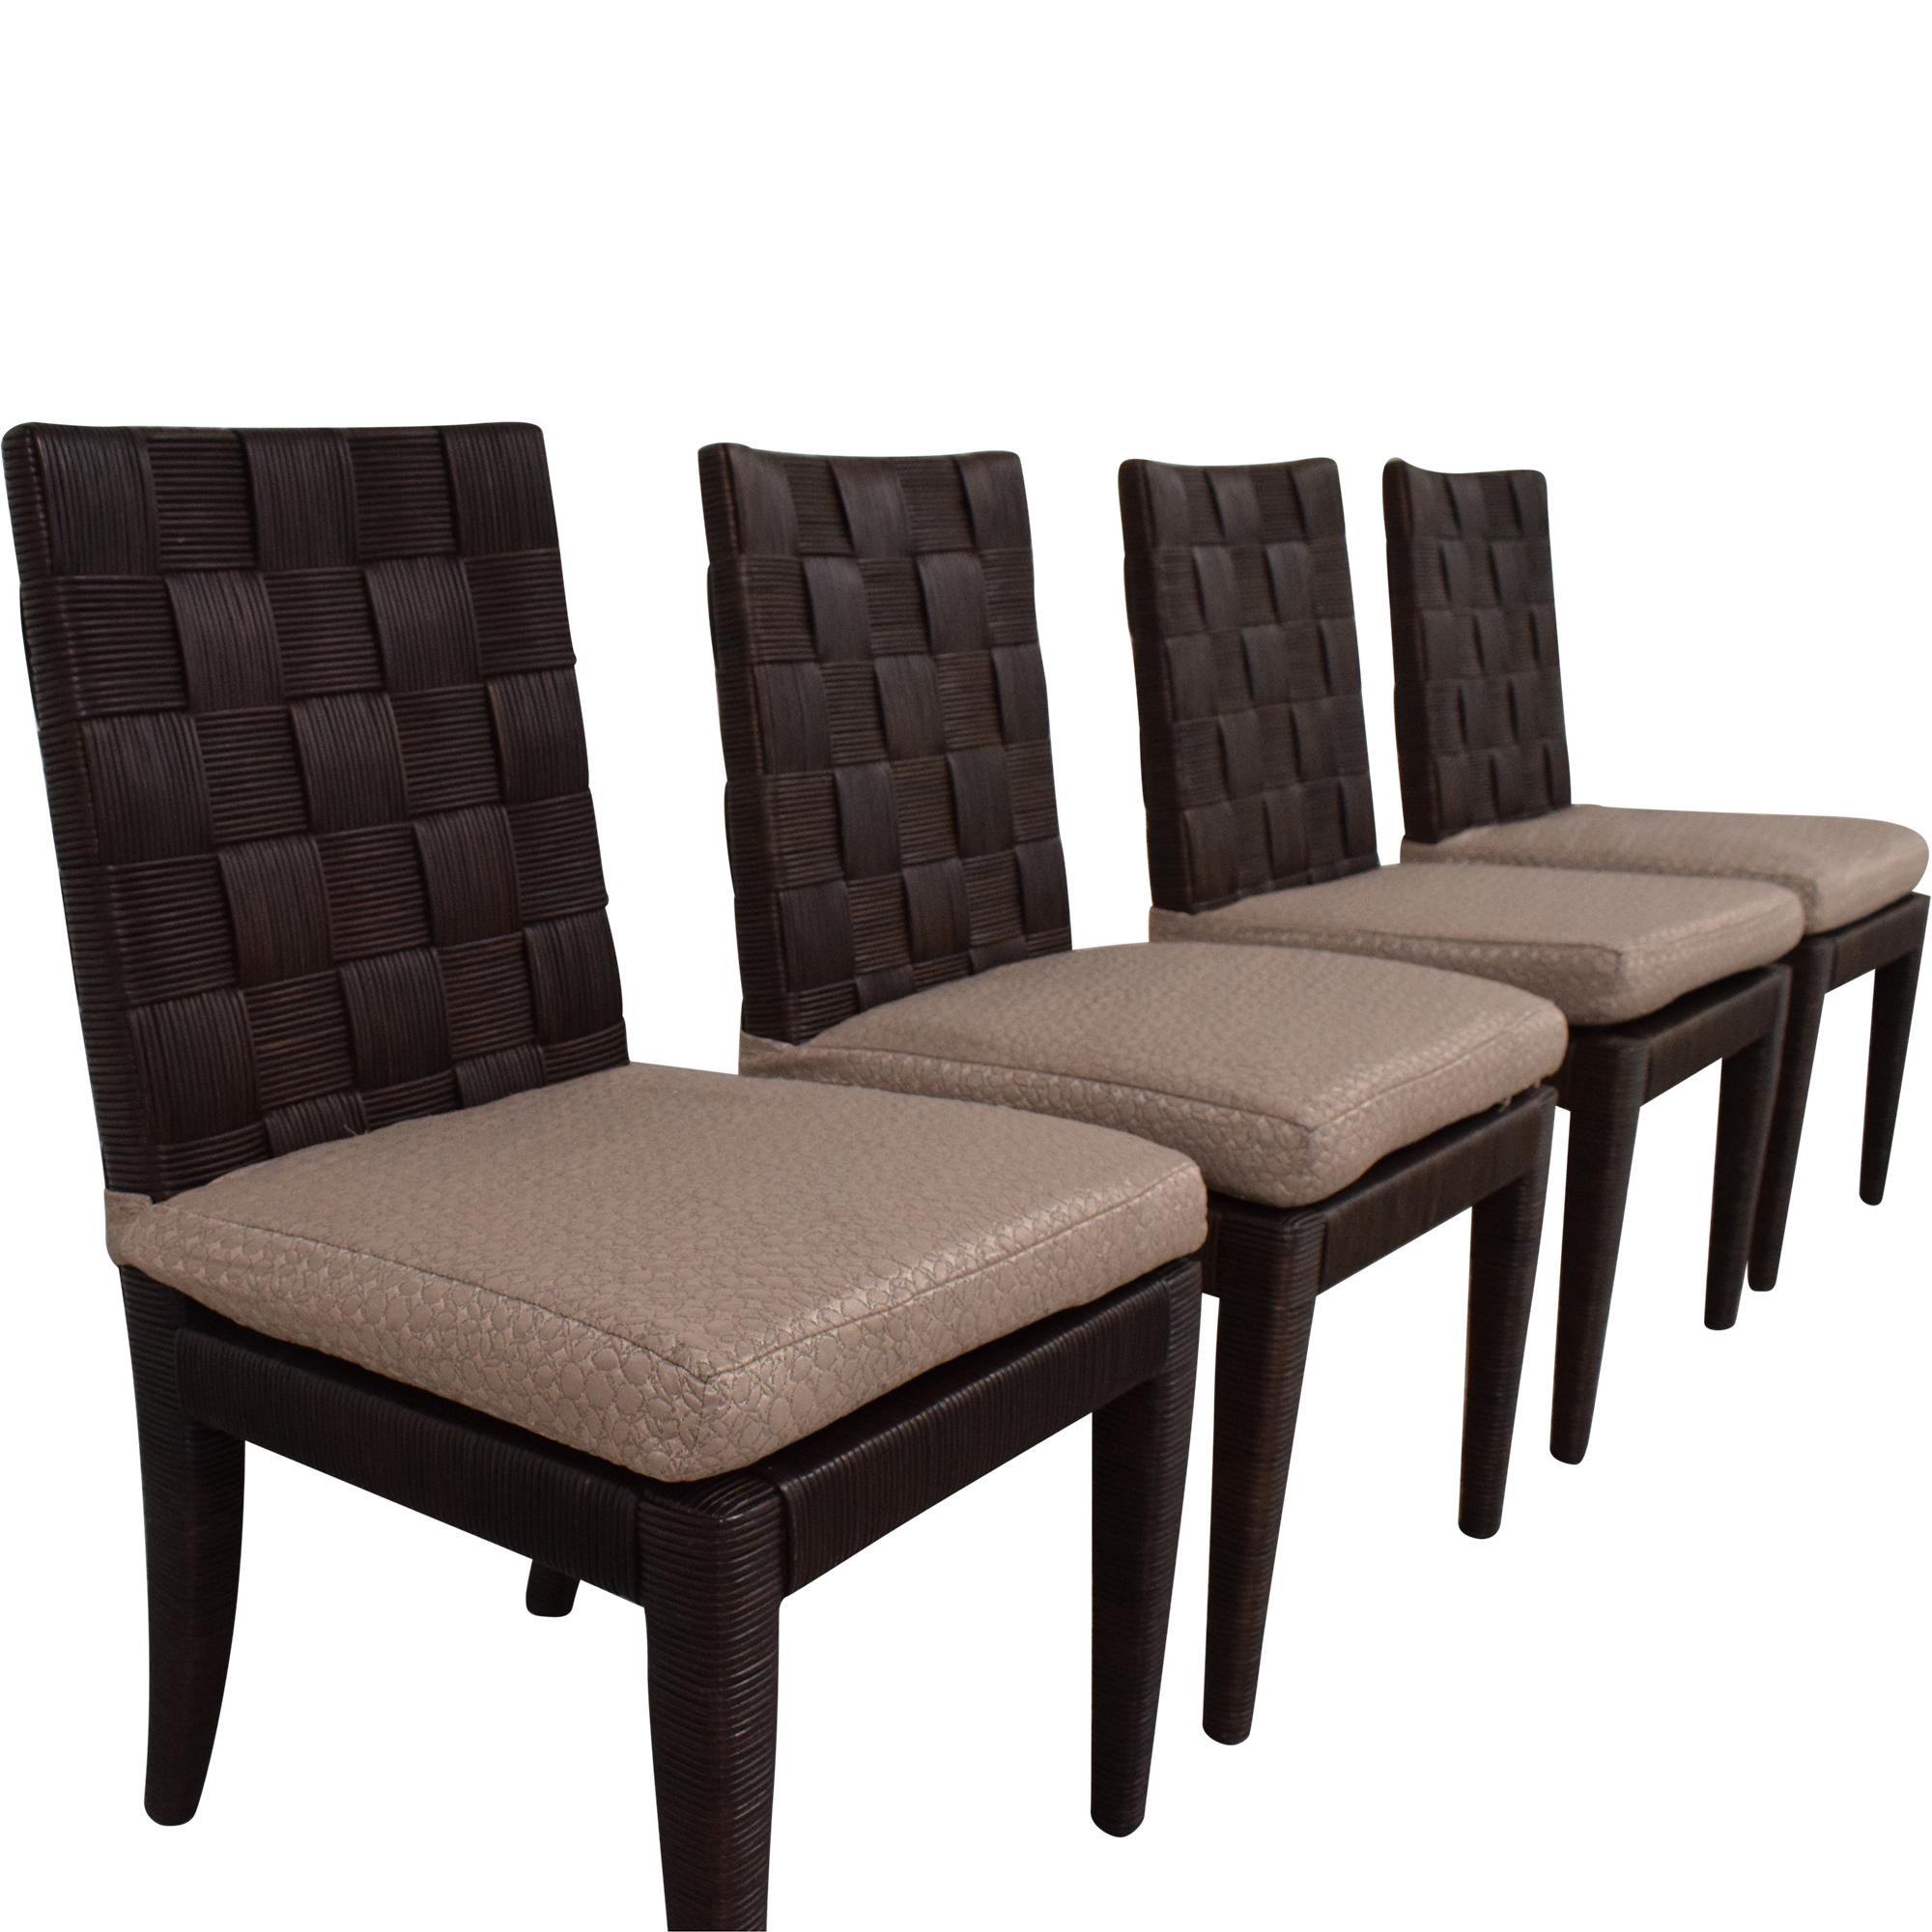 Donghia John Hutton Block Island Side Dining Chairs sale